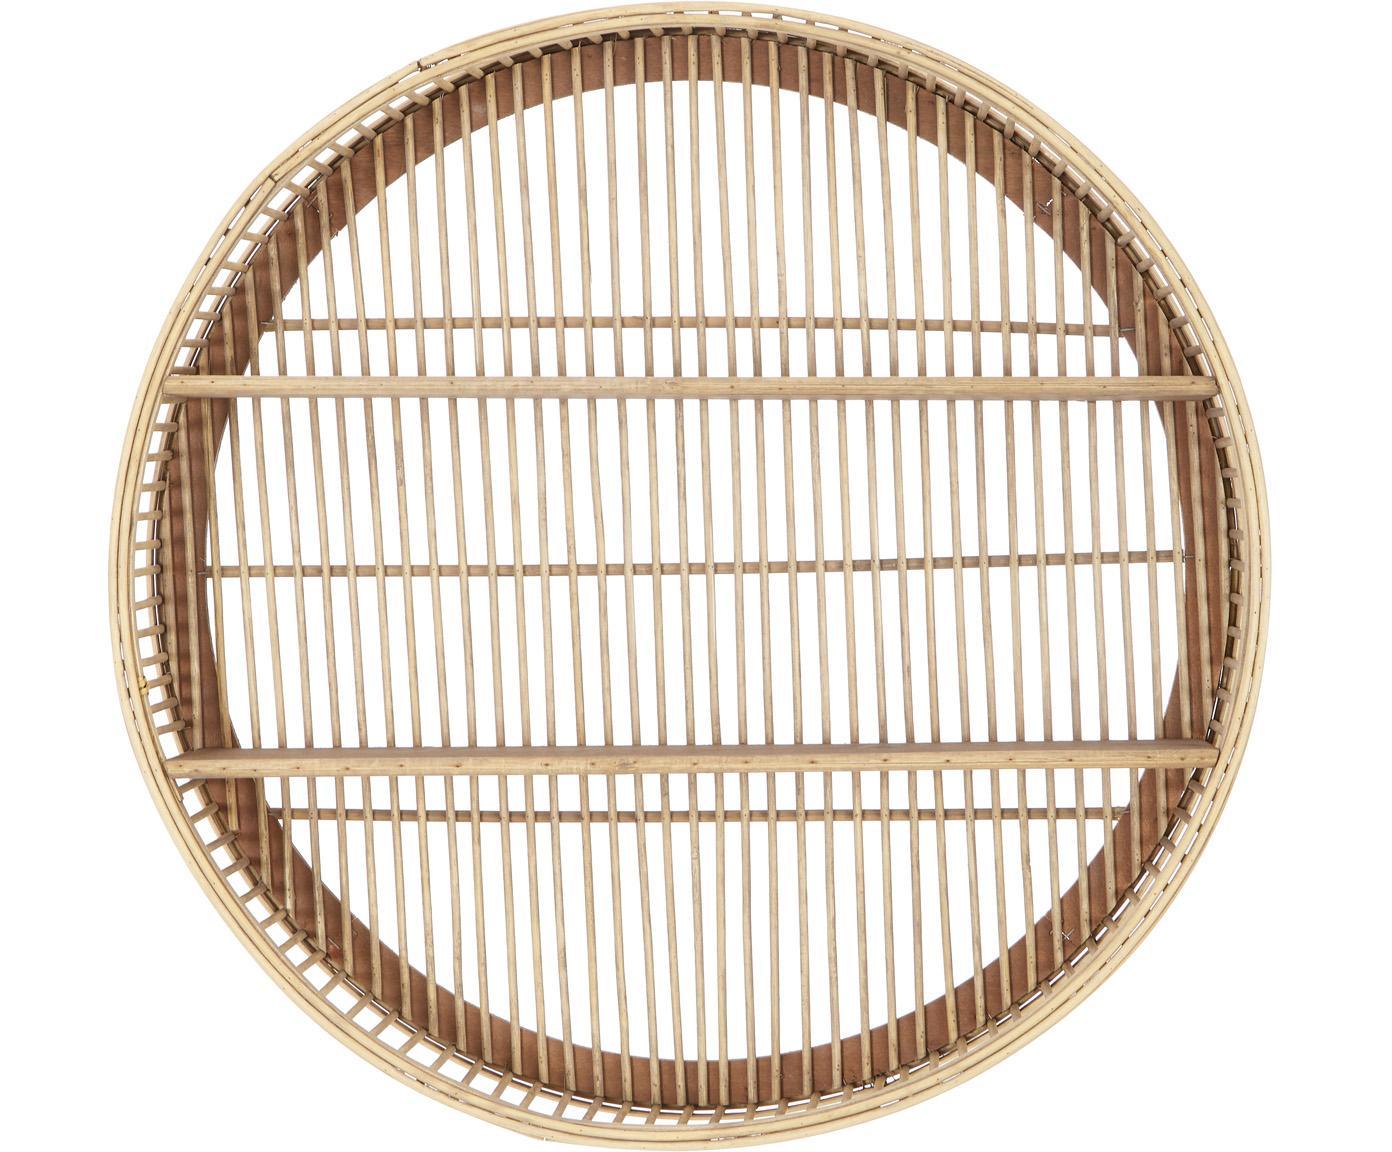 Estante de pared redondo de bambú Bentra, Estante: madera contrachapada, Beige oscuro, Ø 60 x Al 20 cm